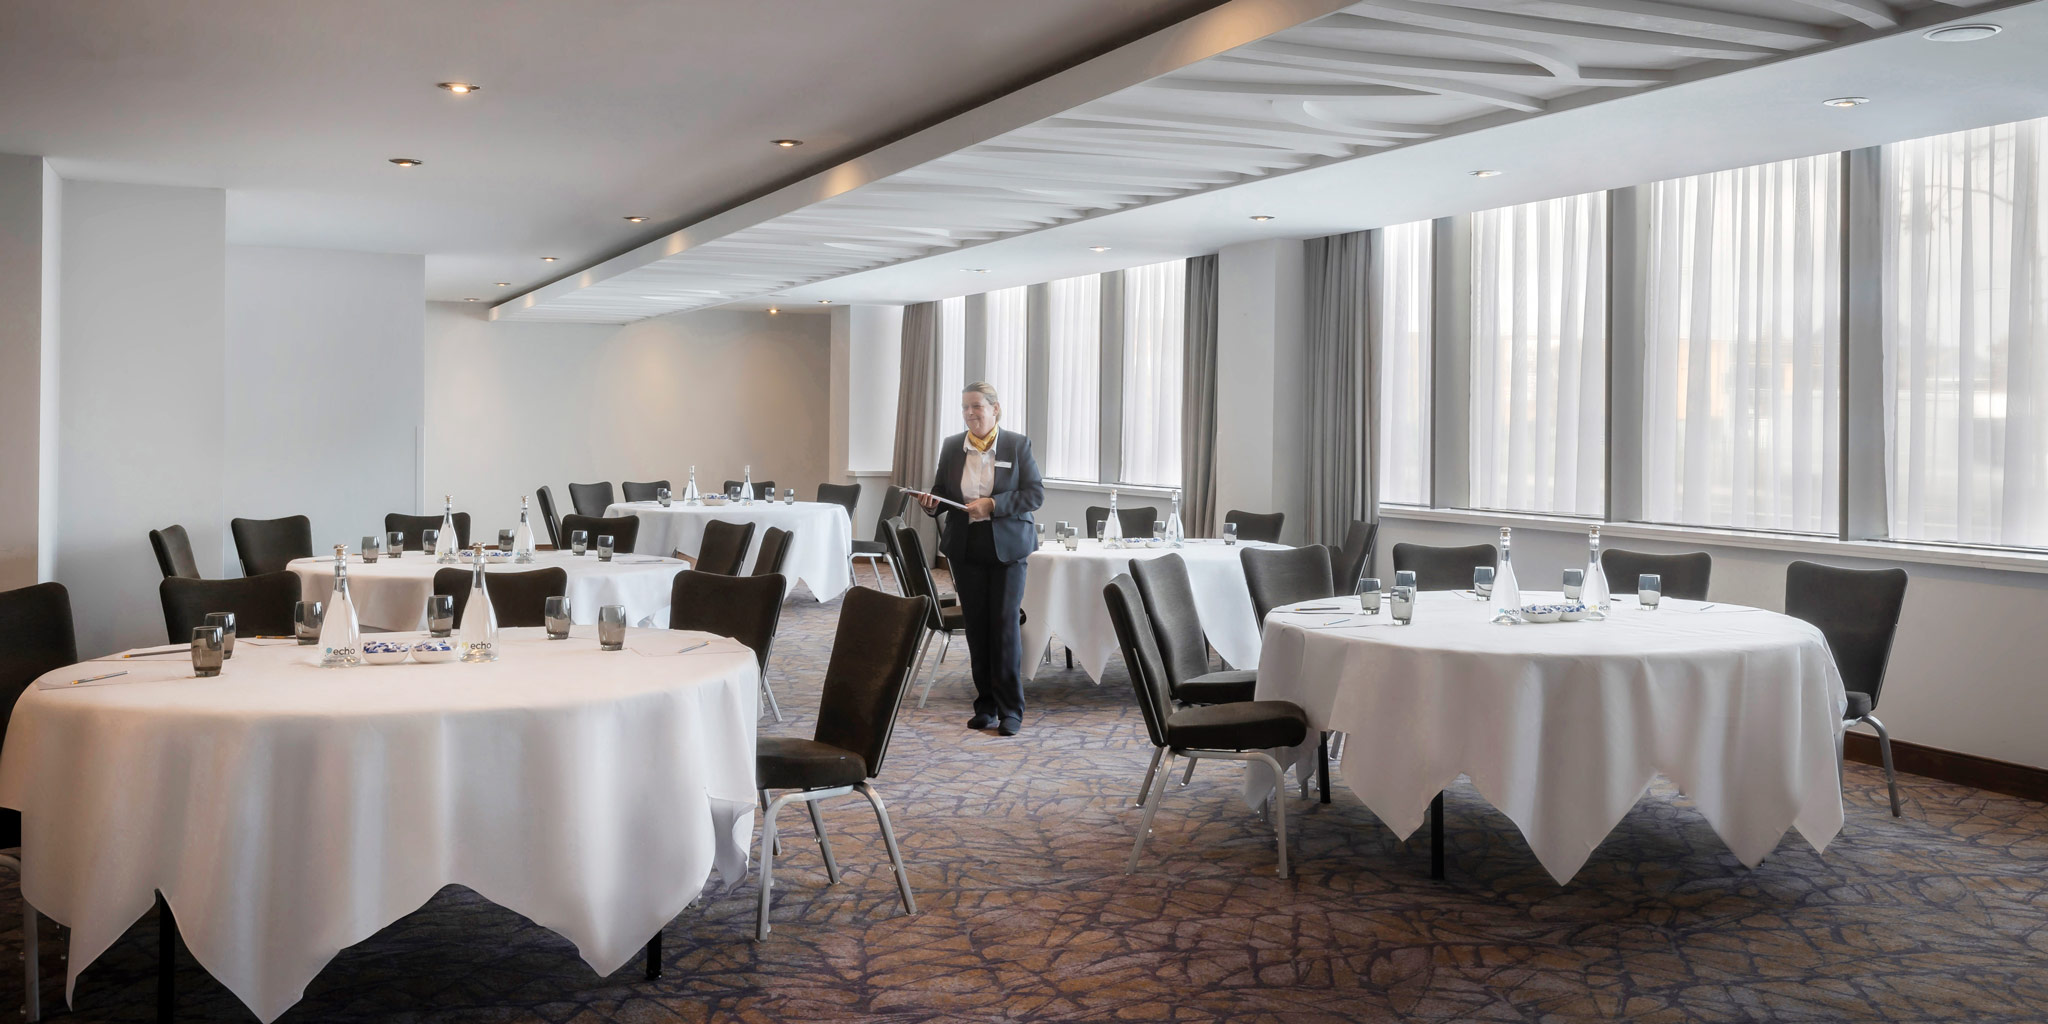 Cabaret-Meeting-Room-Maldron-Tallaght